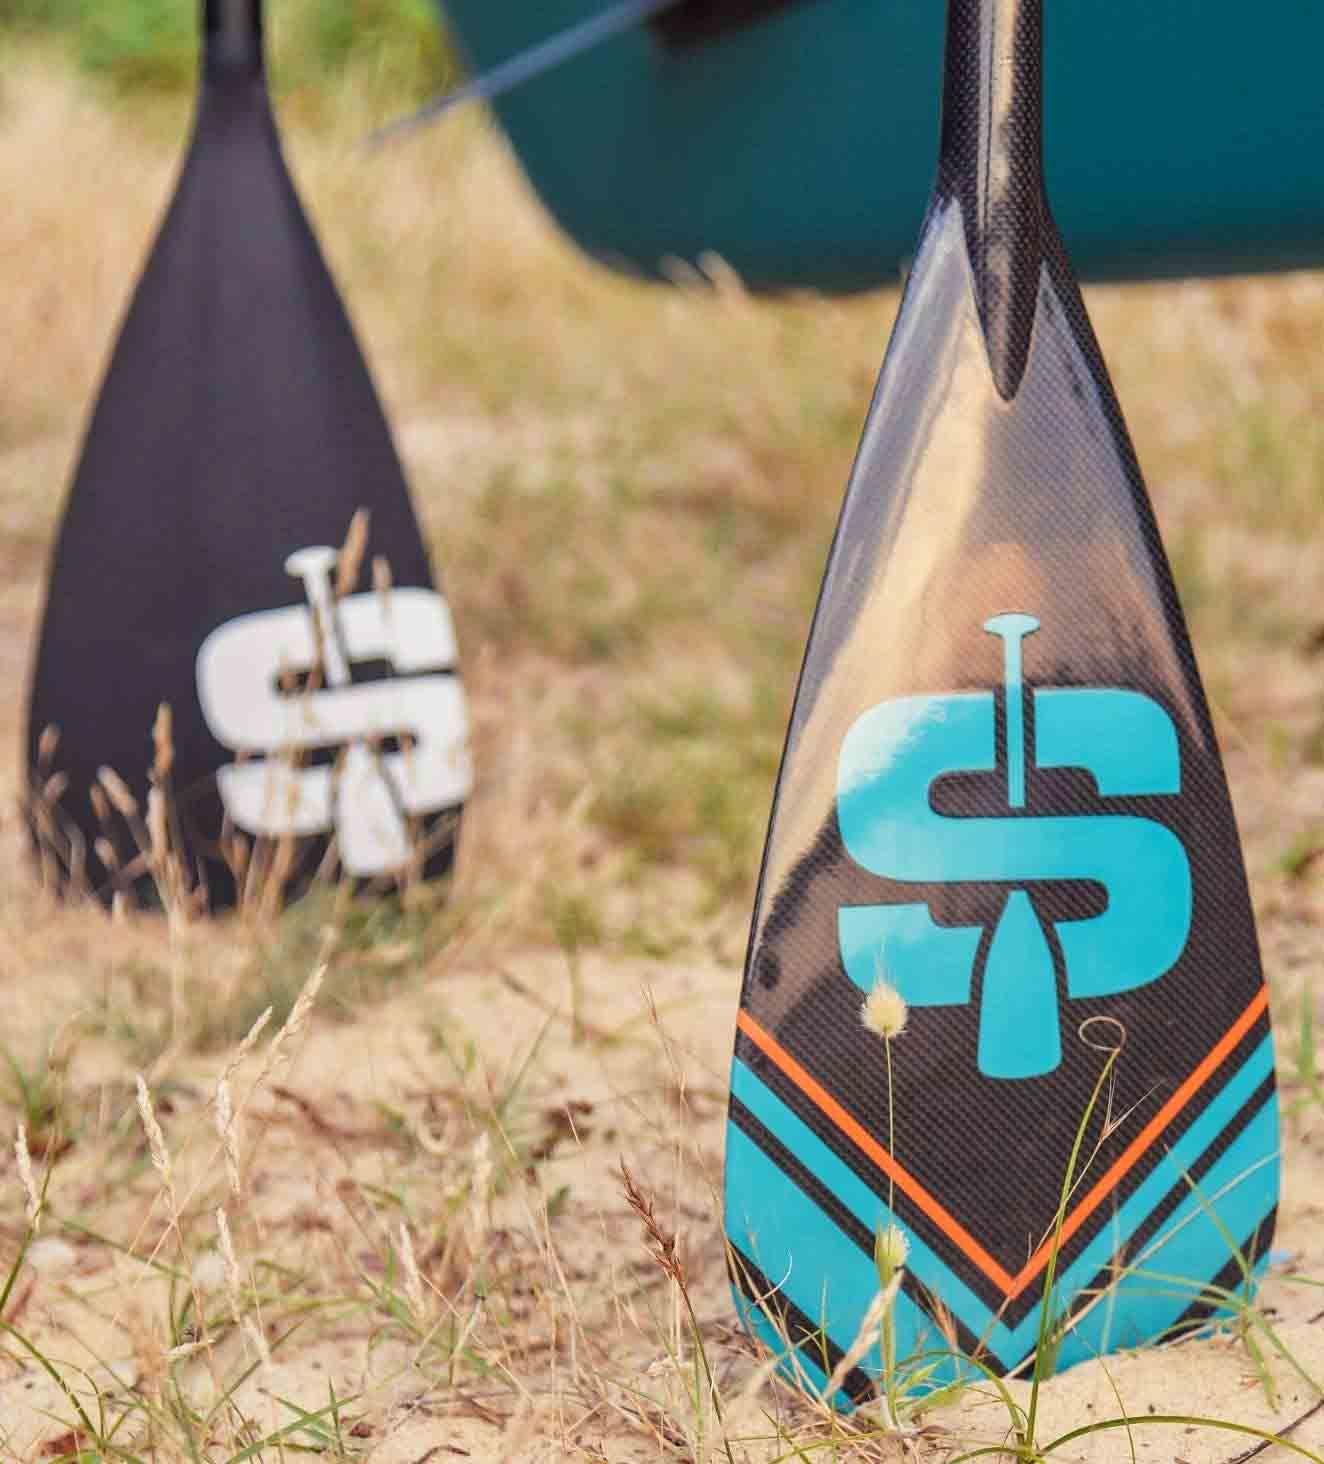 Mejores remos de paddle surf de carbono – TOP 5 de 2020